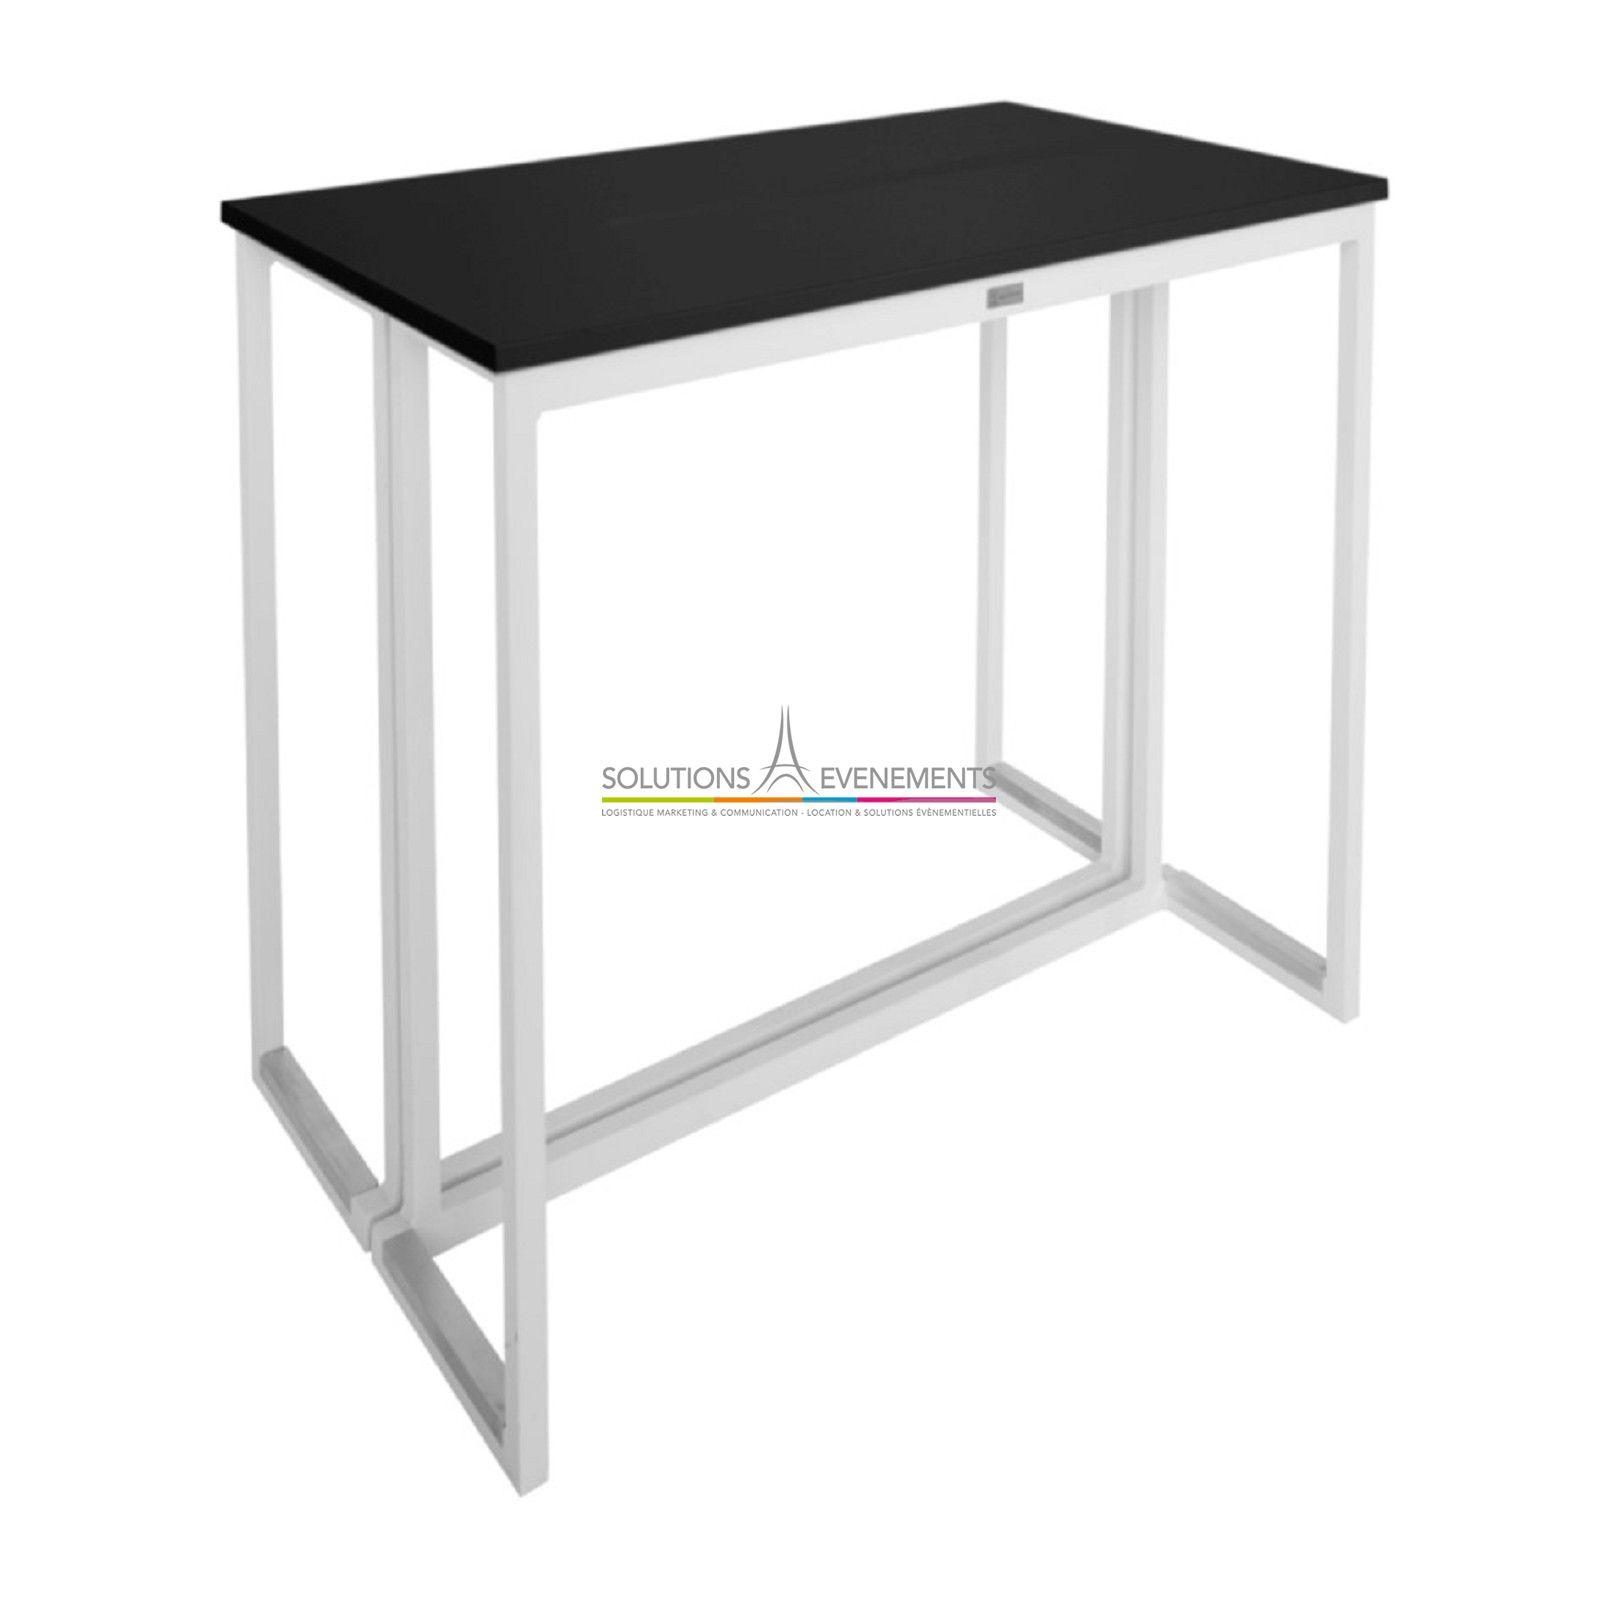 location table haute kubo blanche et noire solutions evenements. Black Bedroom Furniture Sets. Home Design Ideas